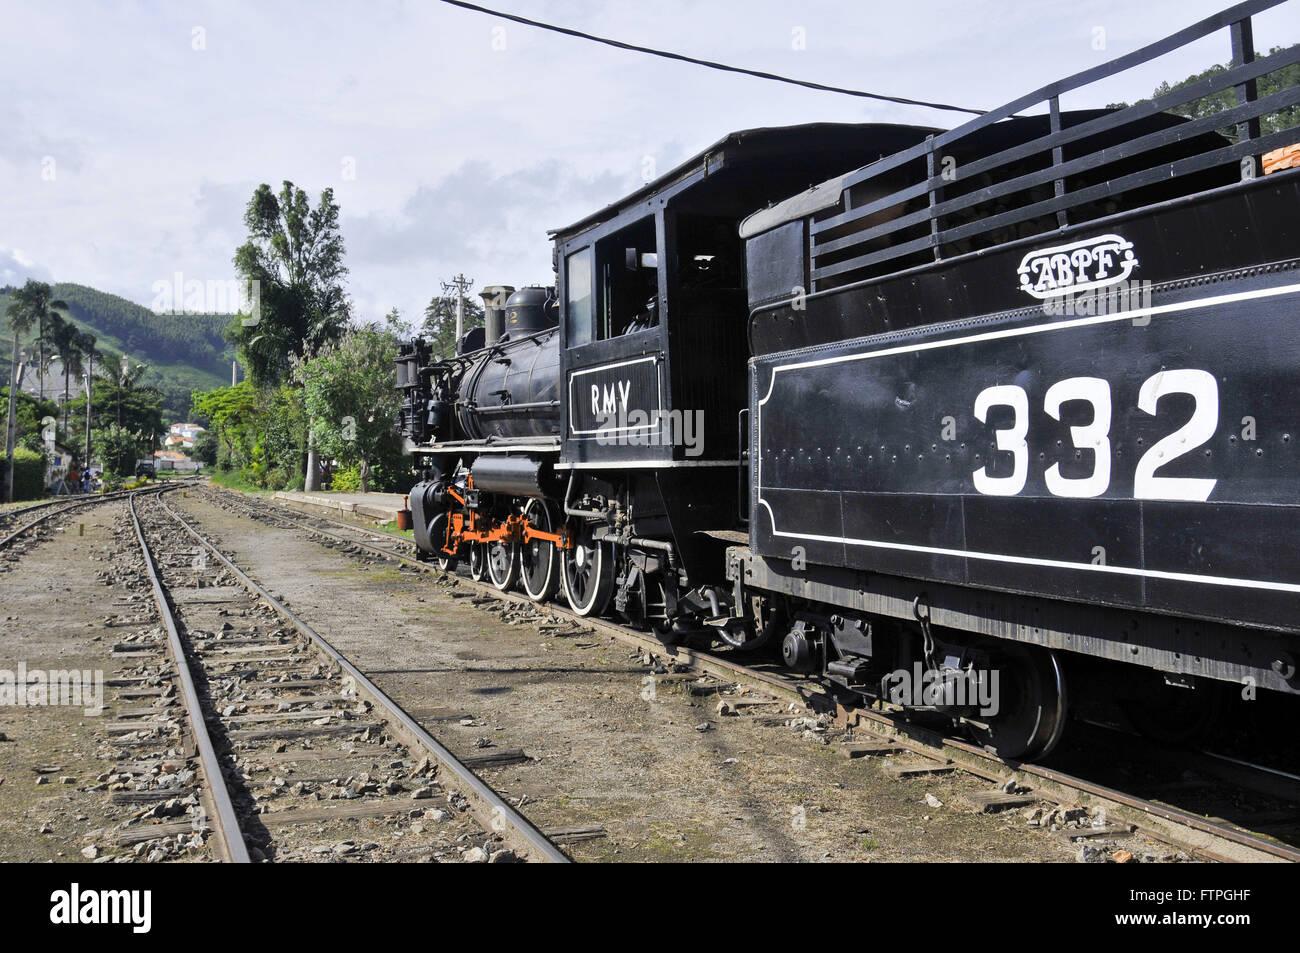 Railway locomotive 332 in the ABPF - Brazilian Association of Railway Preservation - Stock Image